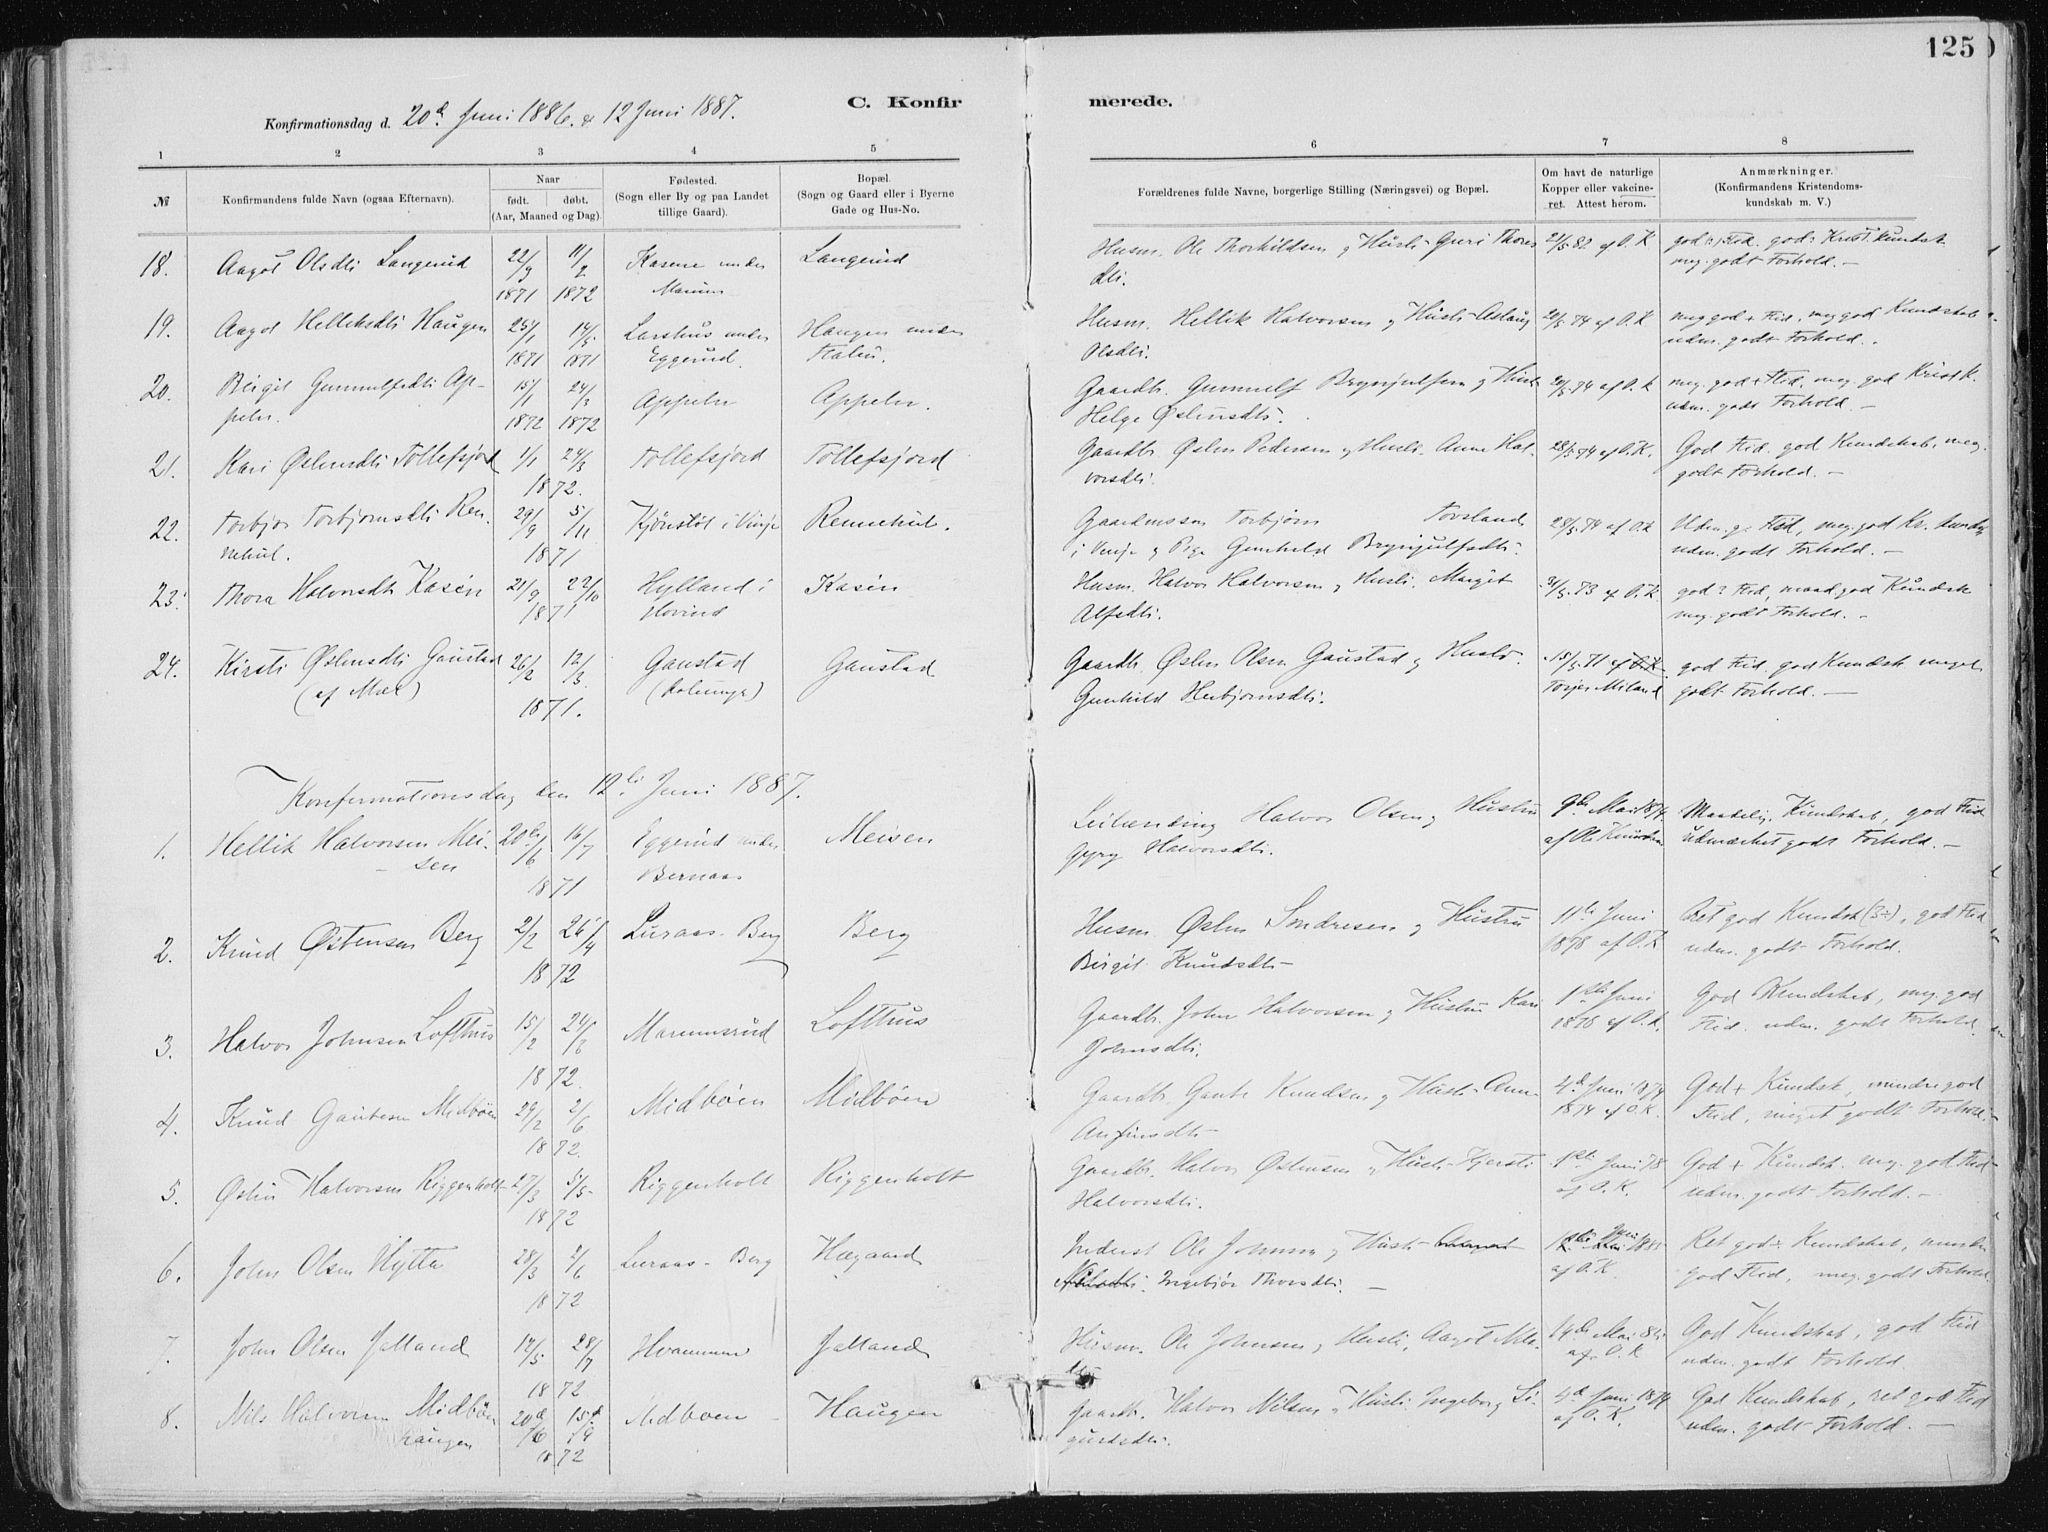 SAKO, Tinn kirkebøker, F/Fa/L0007: Ministerialbok nr. I 7, 1878-1922, s. 125